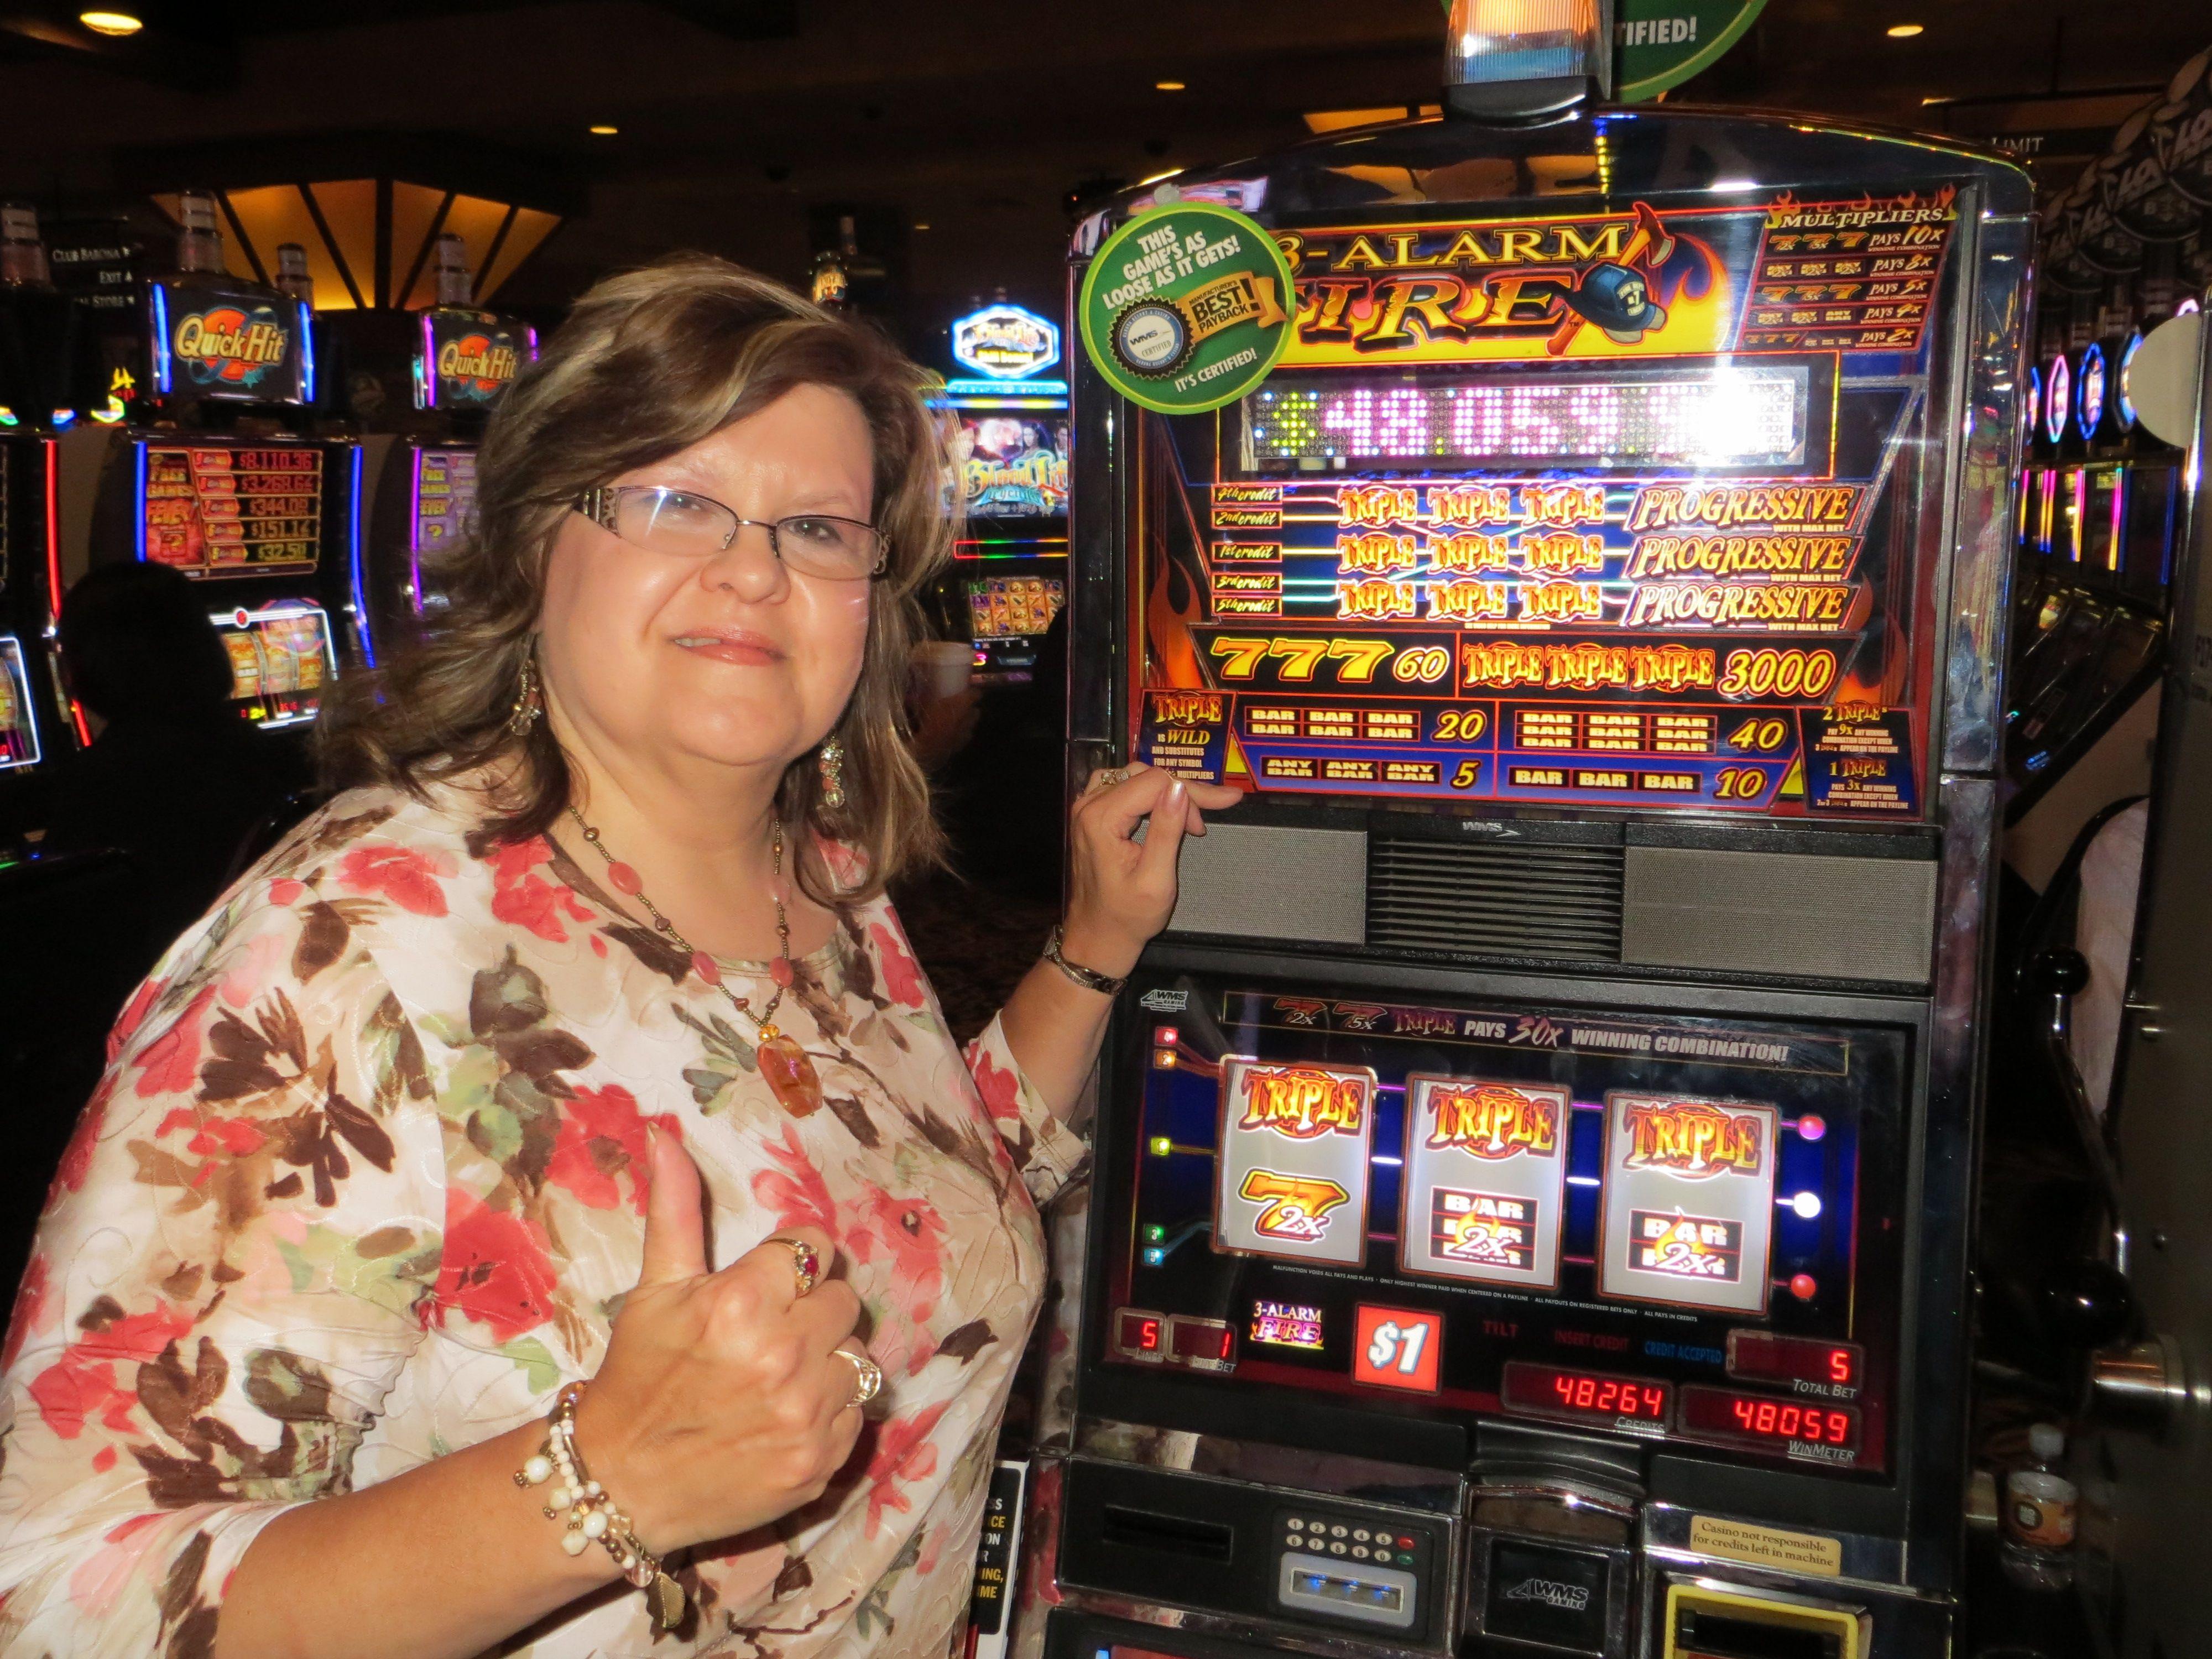 Margie hit for $48,060.00 on our Dollar 3 Alarm Fire. | Best casino, Casino  resort, Casino hotel